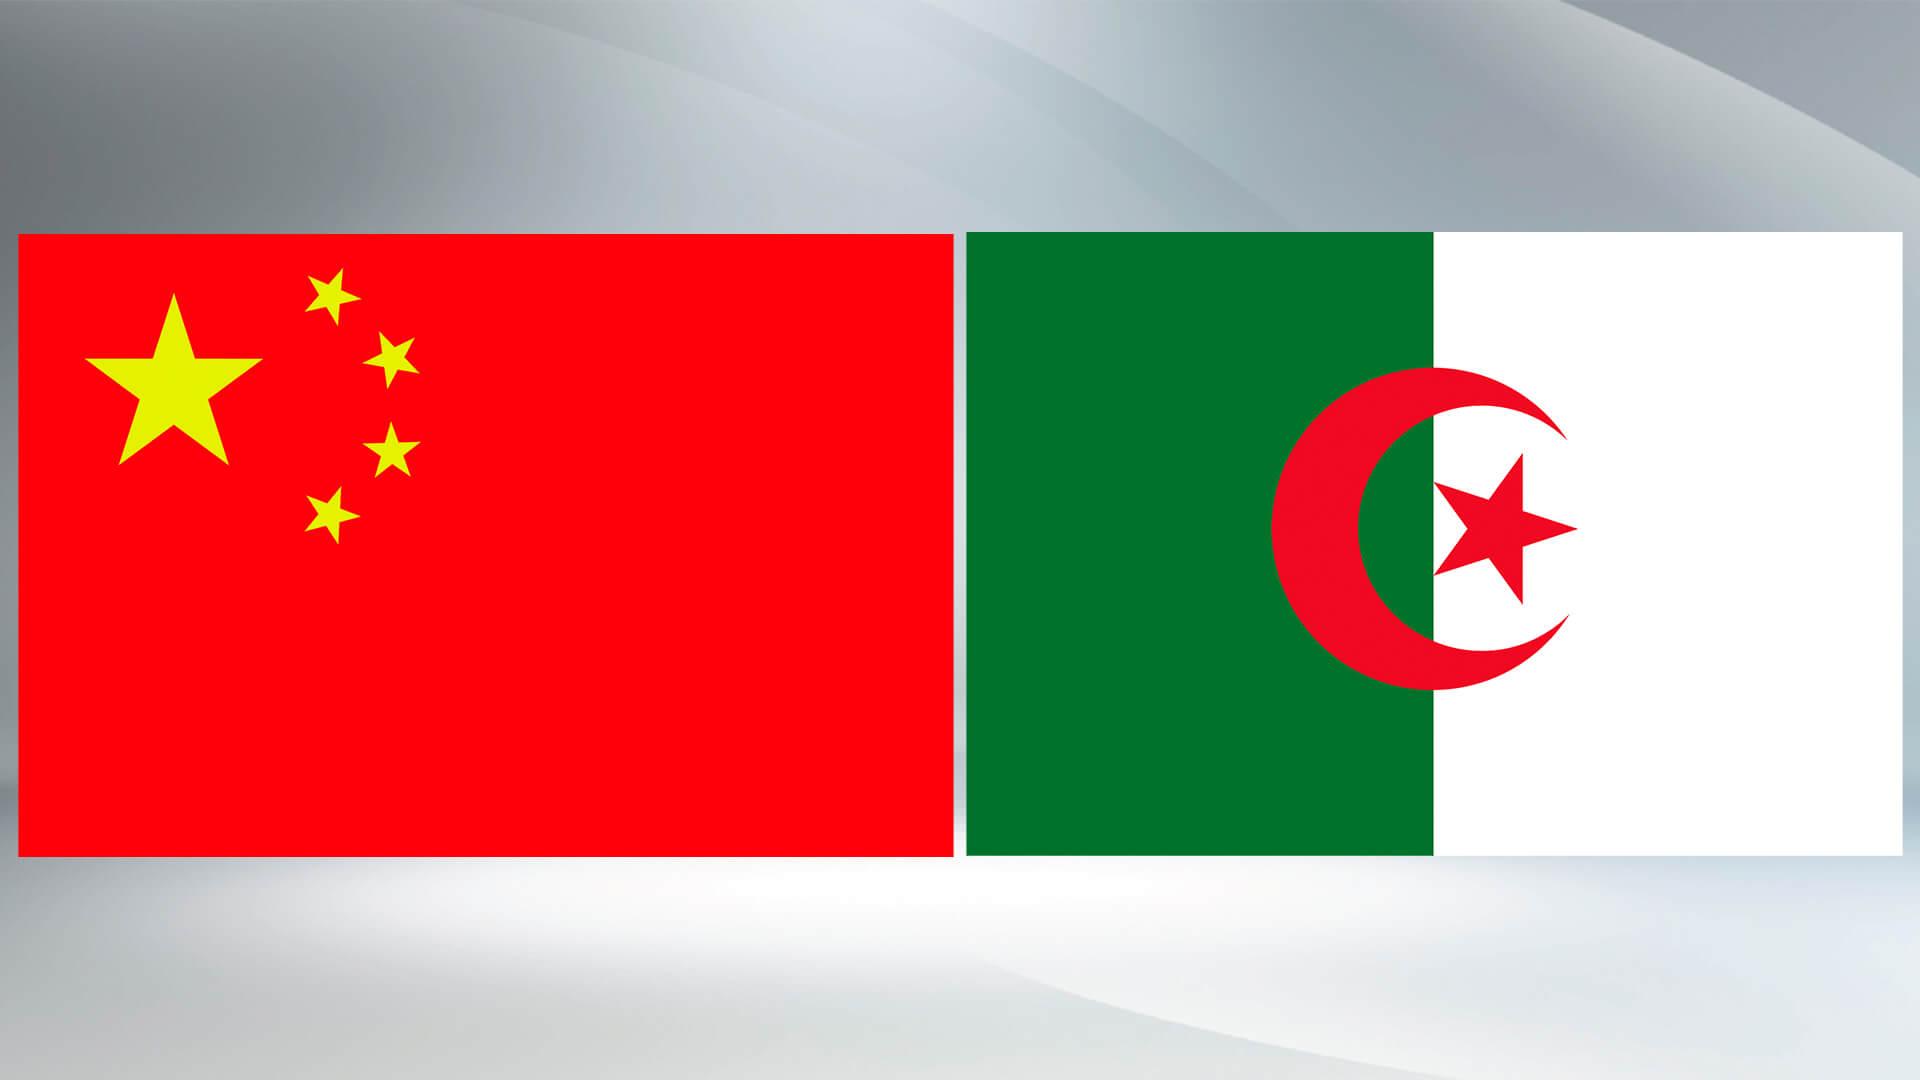 China and Algeria Flag